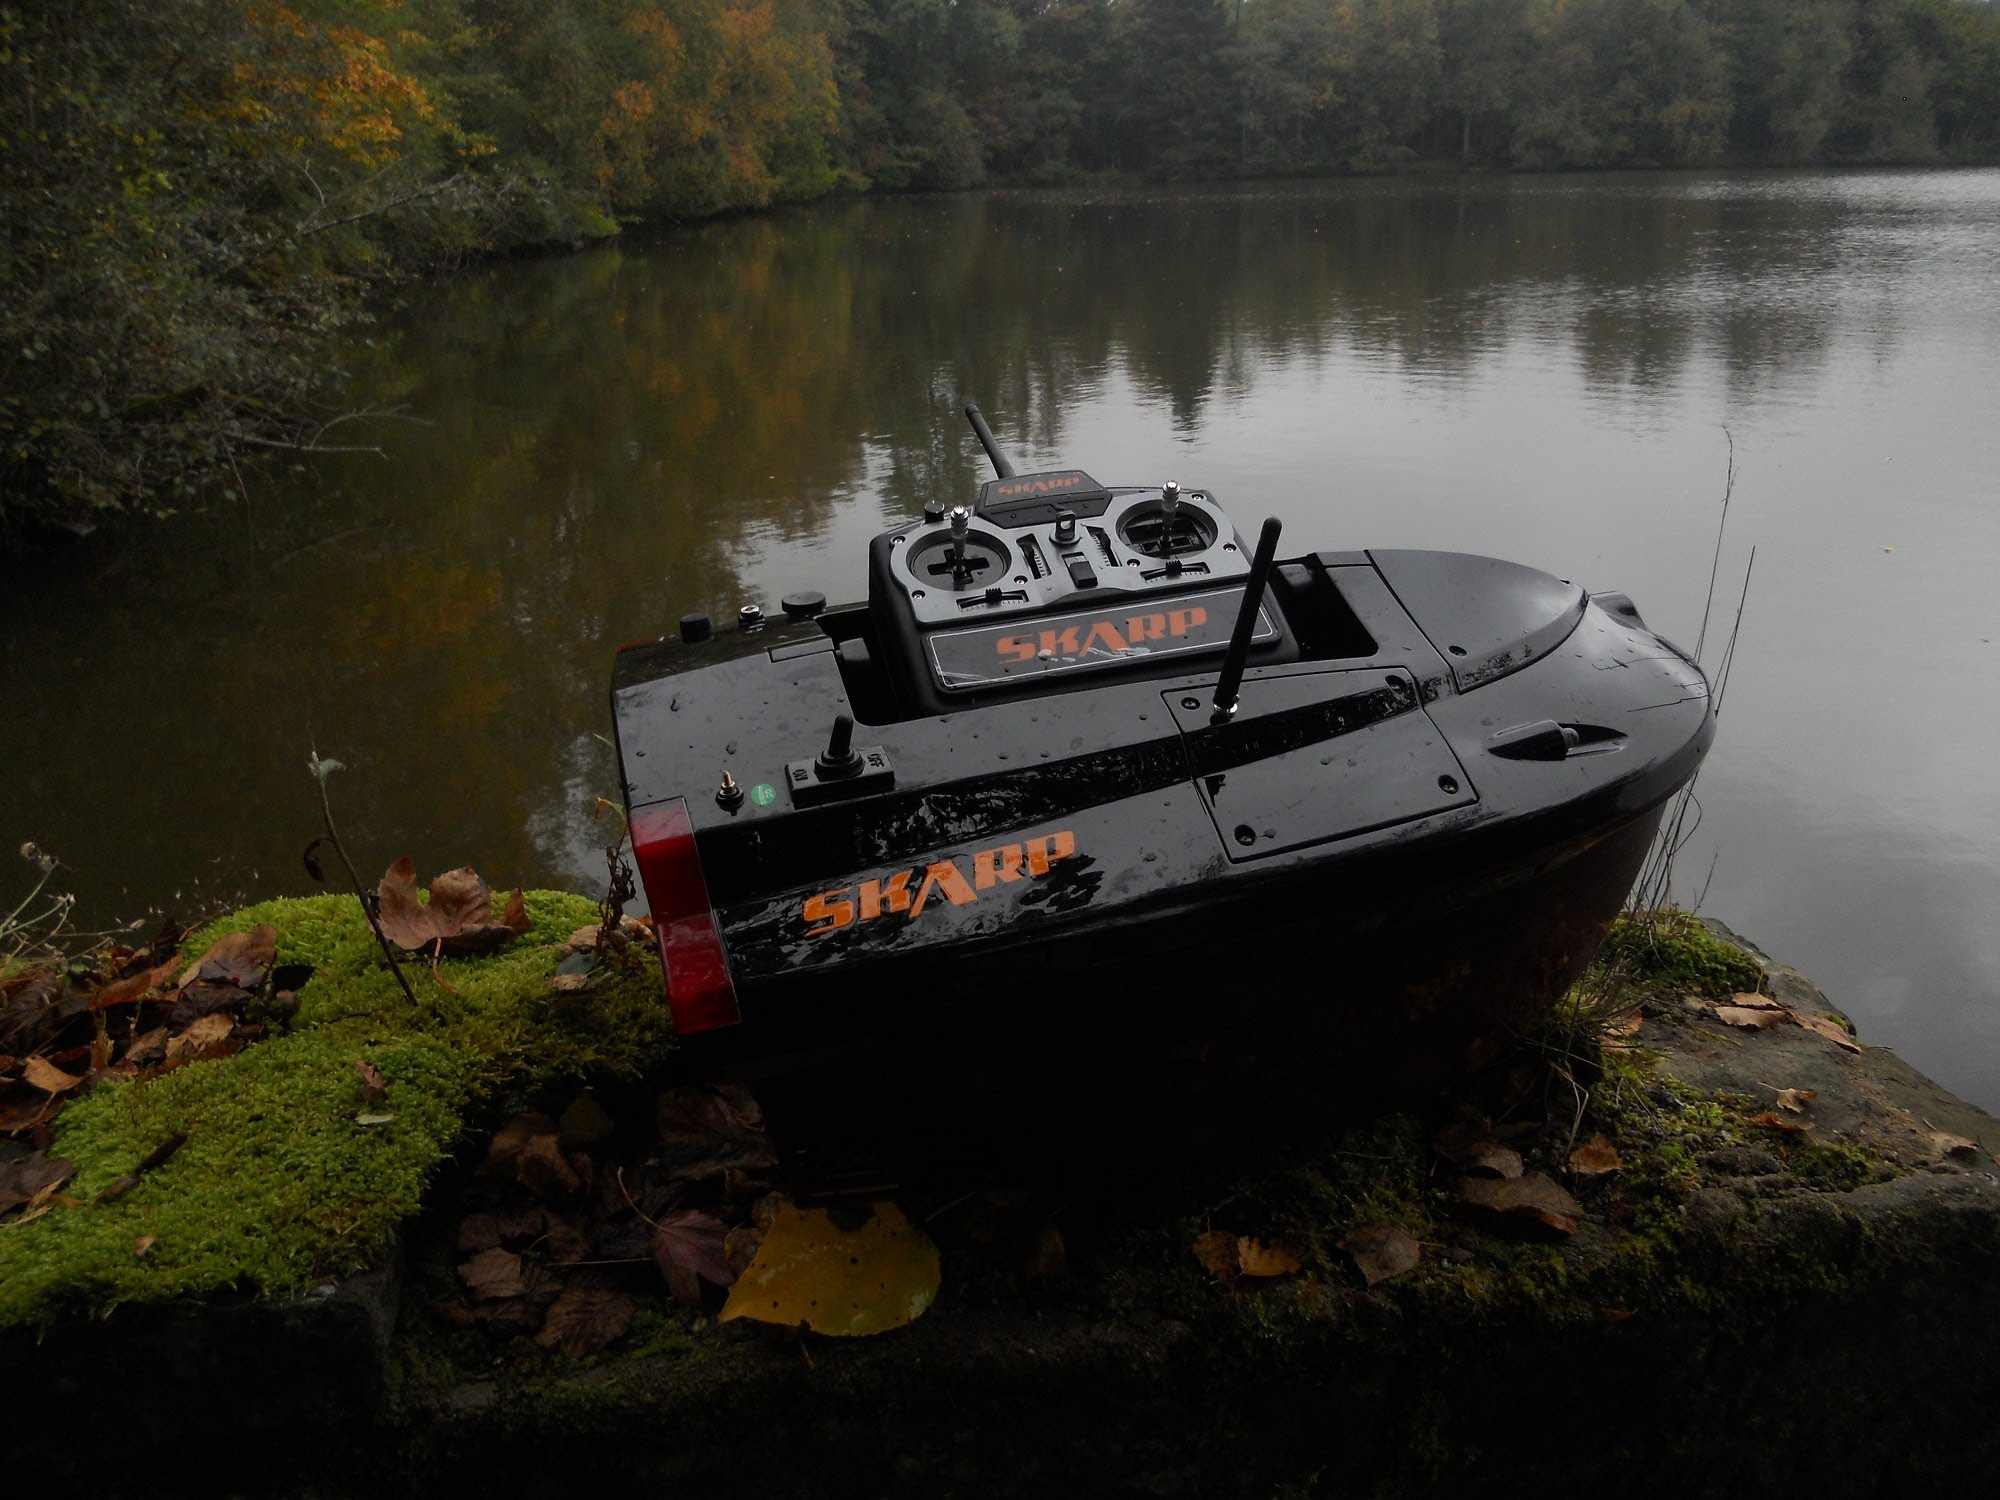 bateau amorceur skarp s60